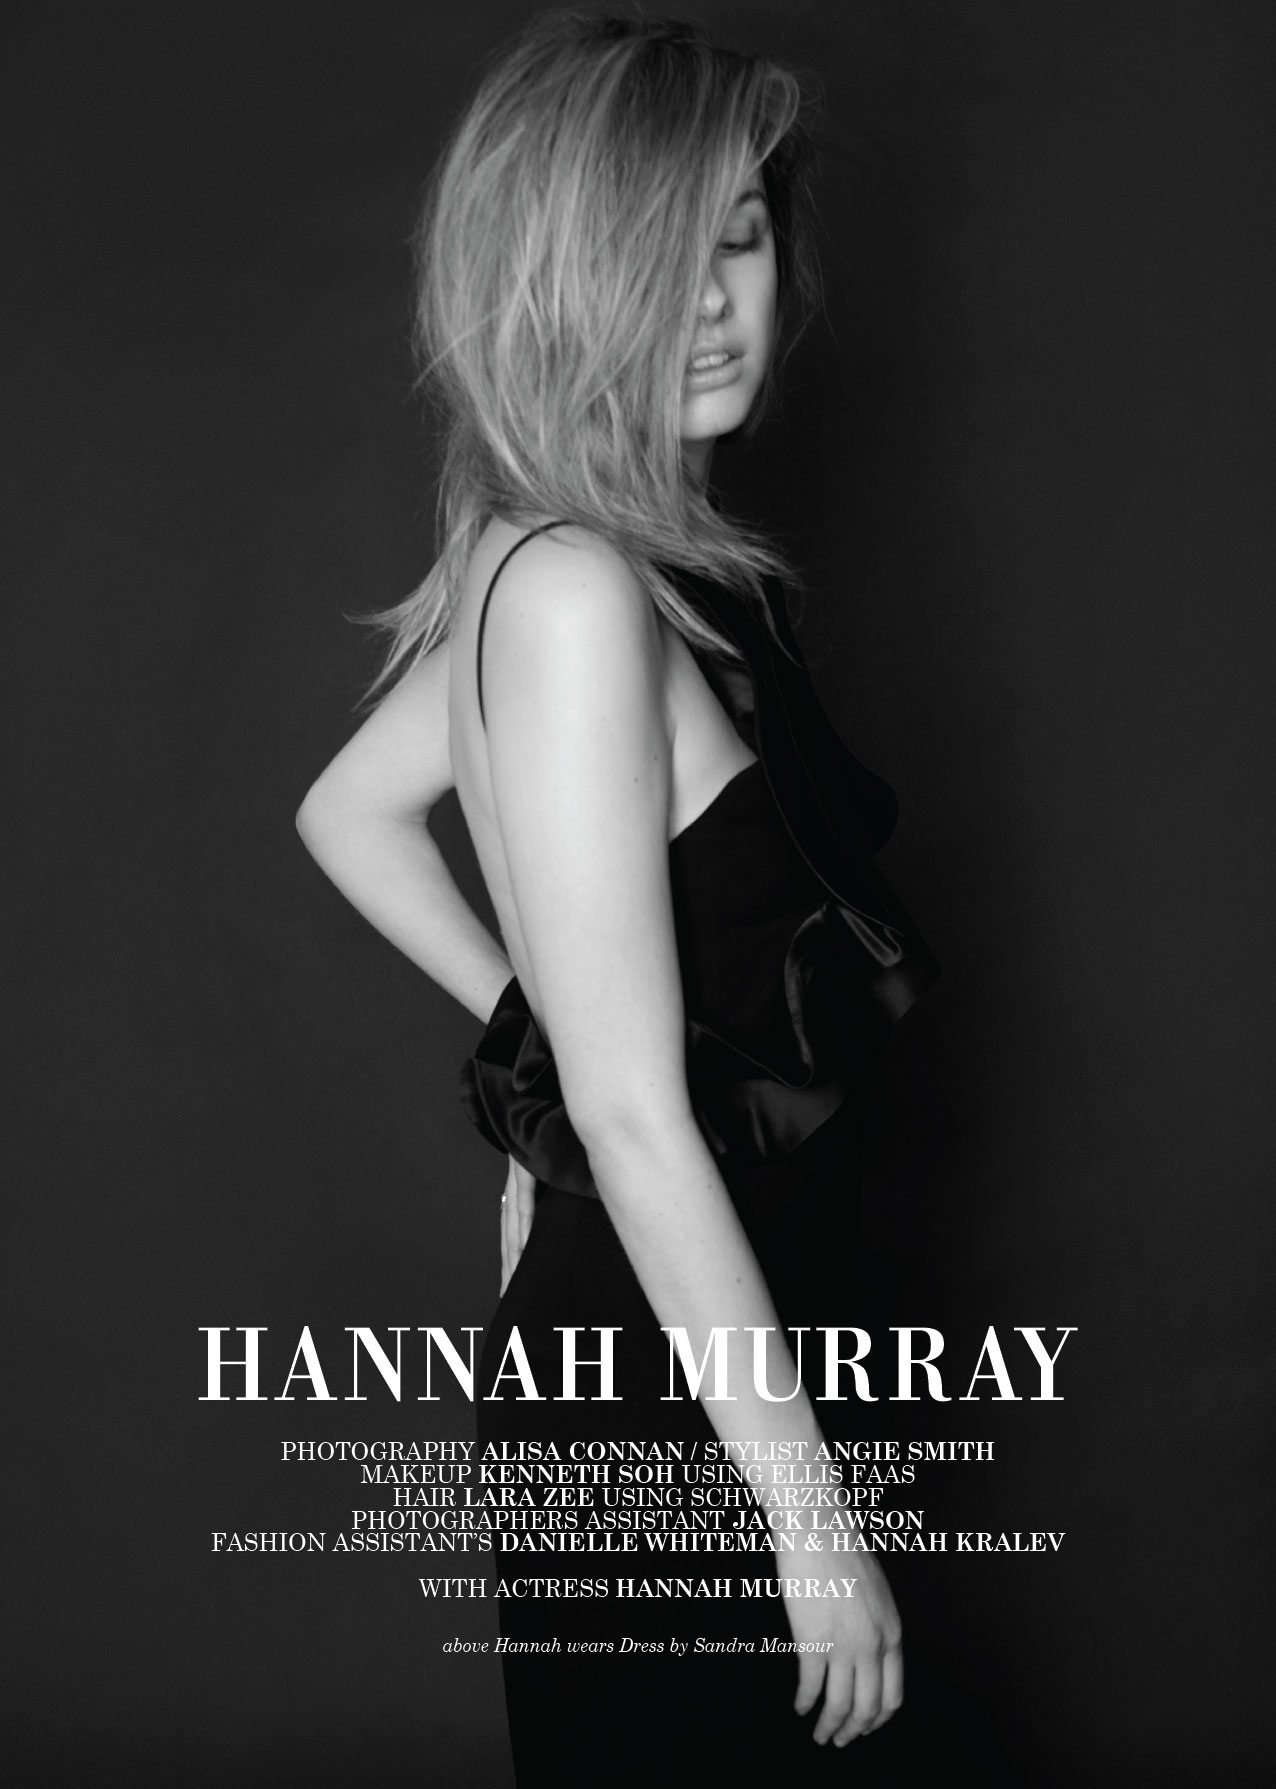 HANNAH01-01